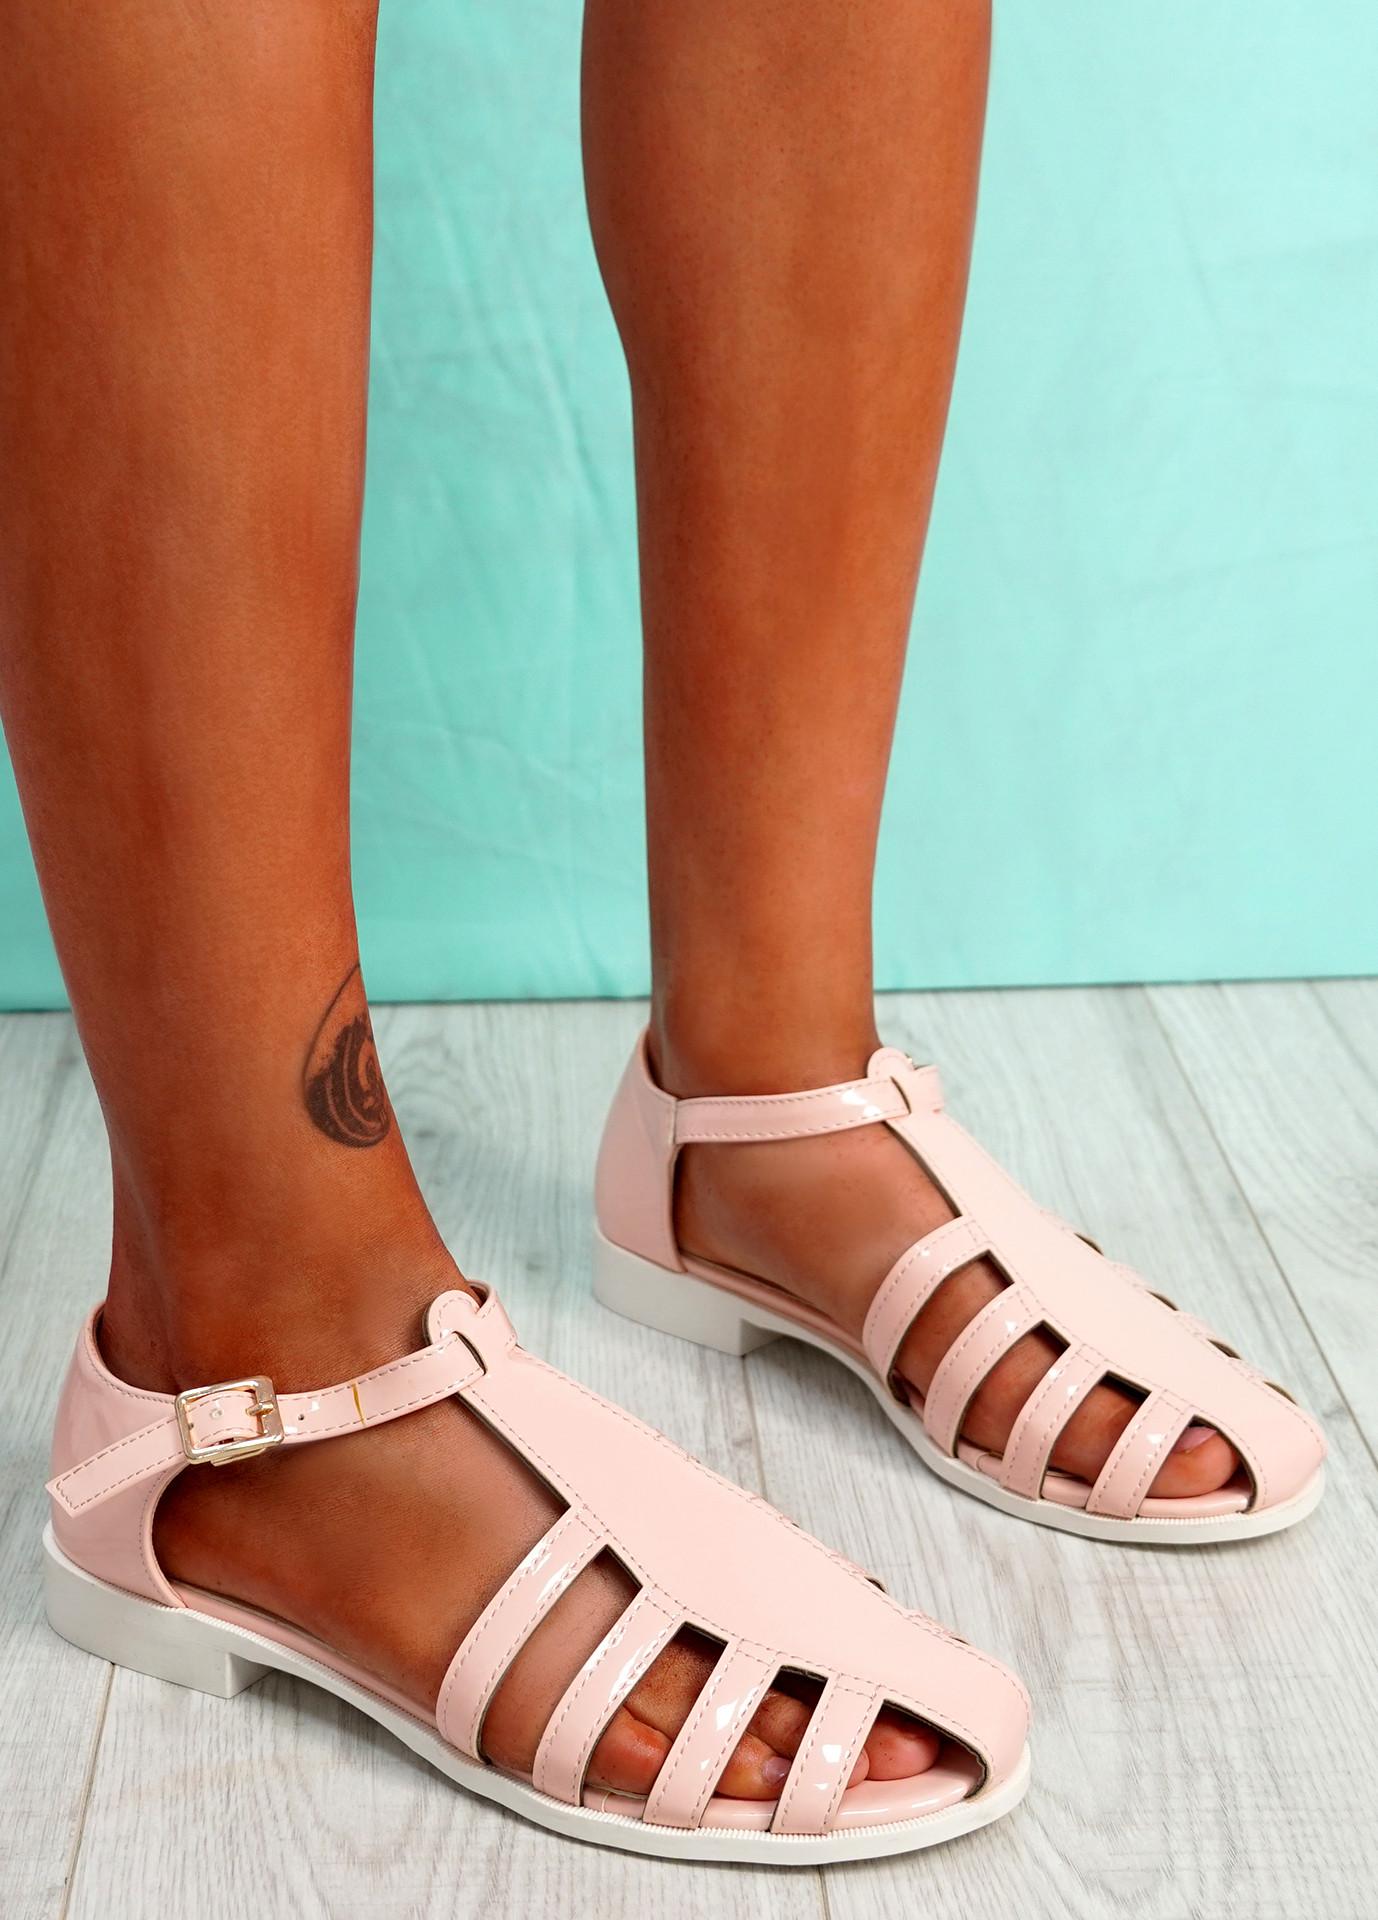 Fedde Pink Flat Sandals